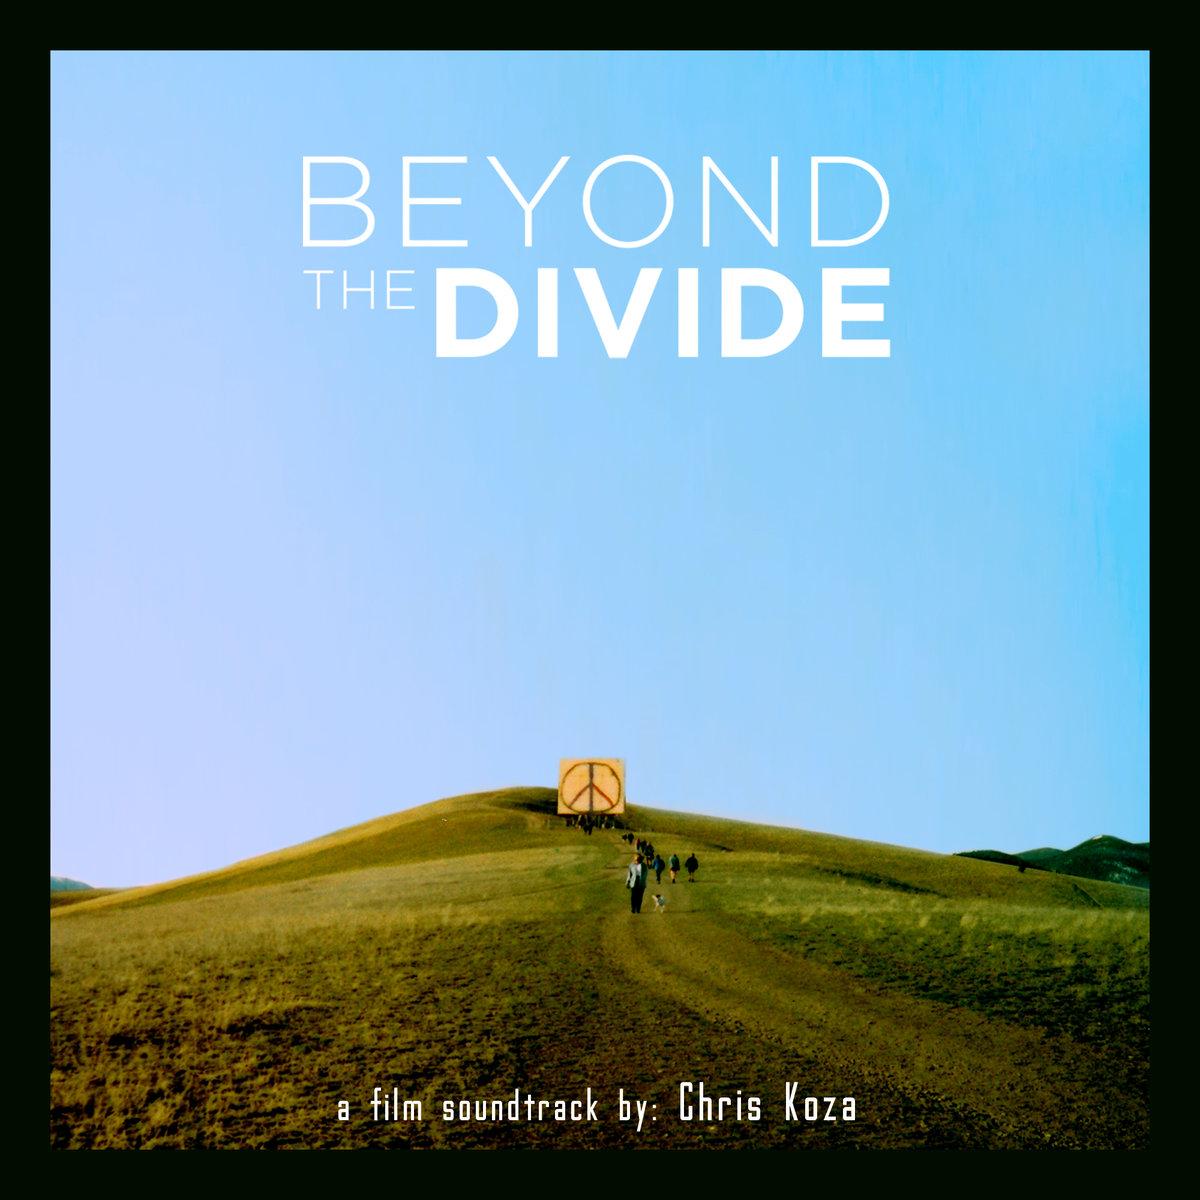 Chris Koza :: Beyond The Divide (Film Soundtrack) (2014)